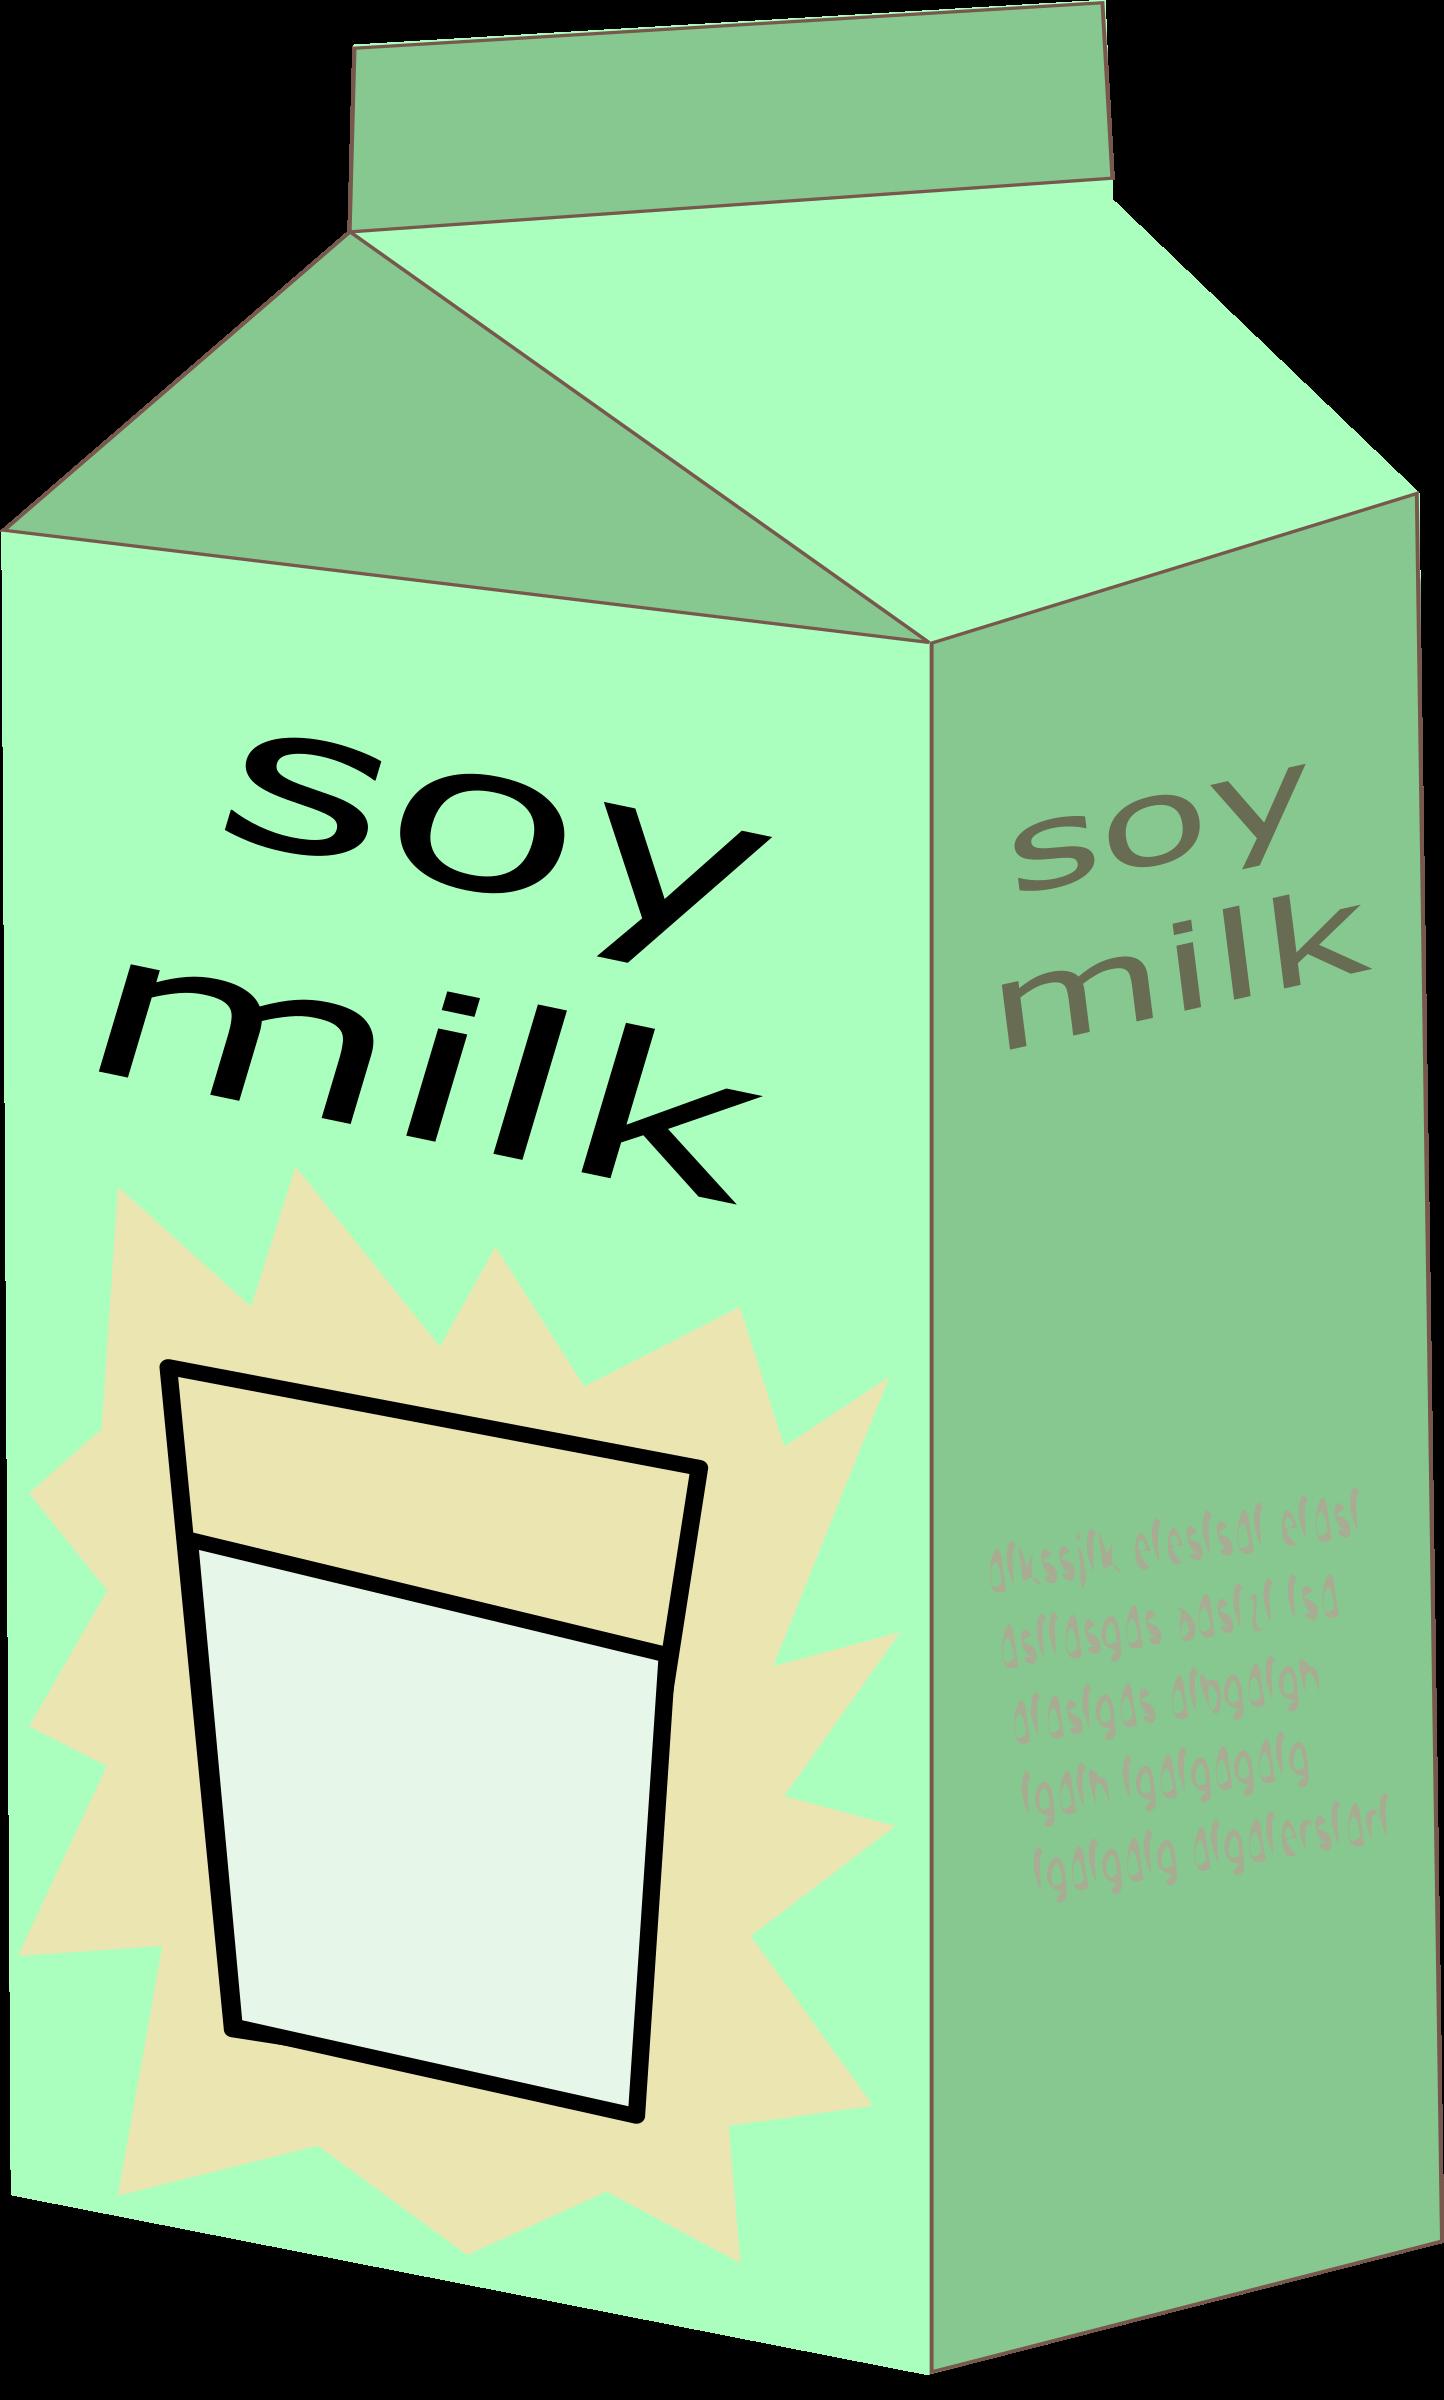 Milk soy milk